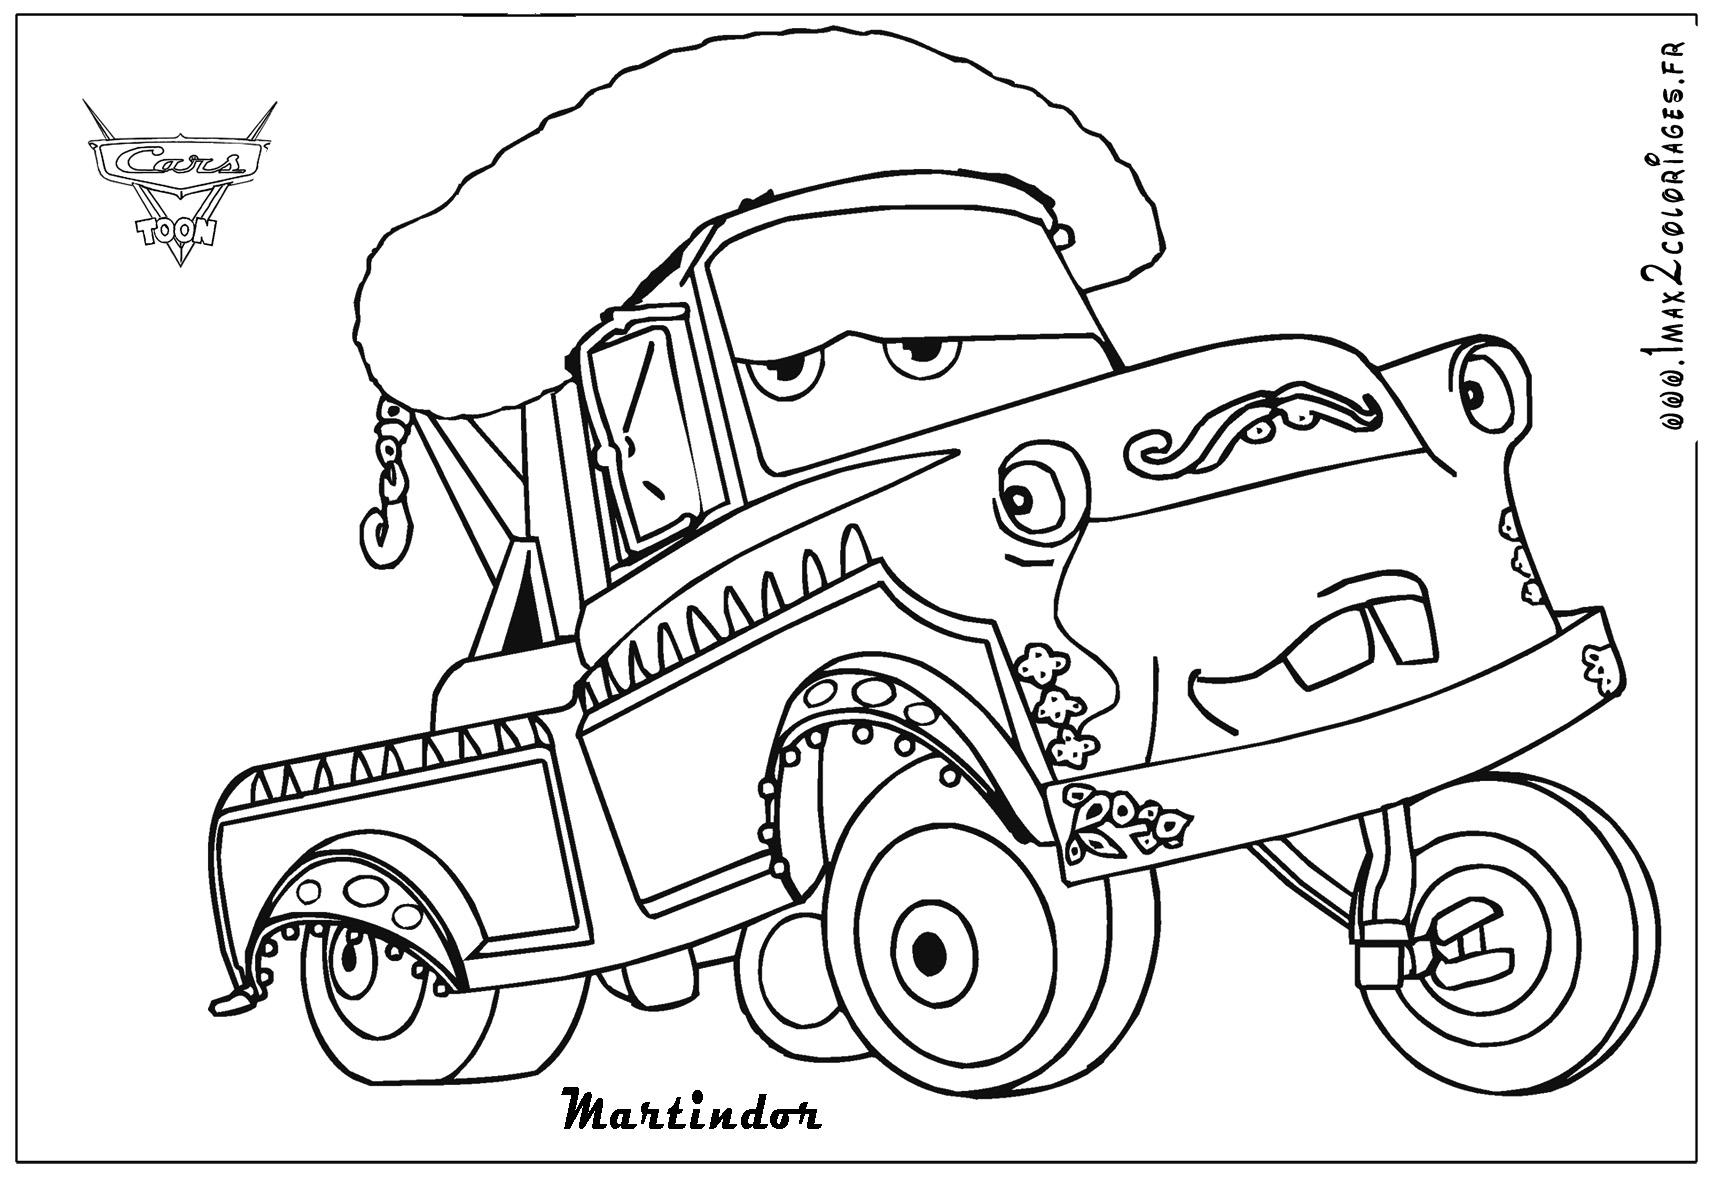 dessin cars 2 gratuit a imprimer